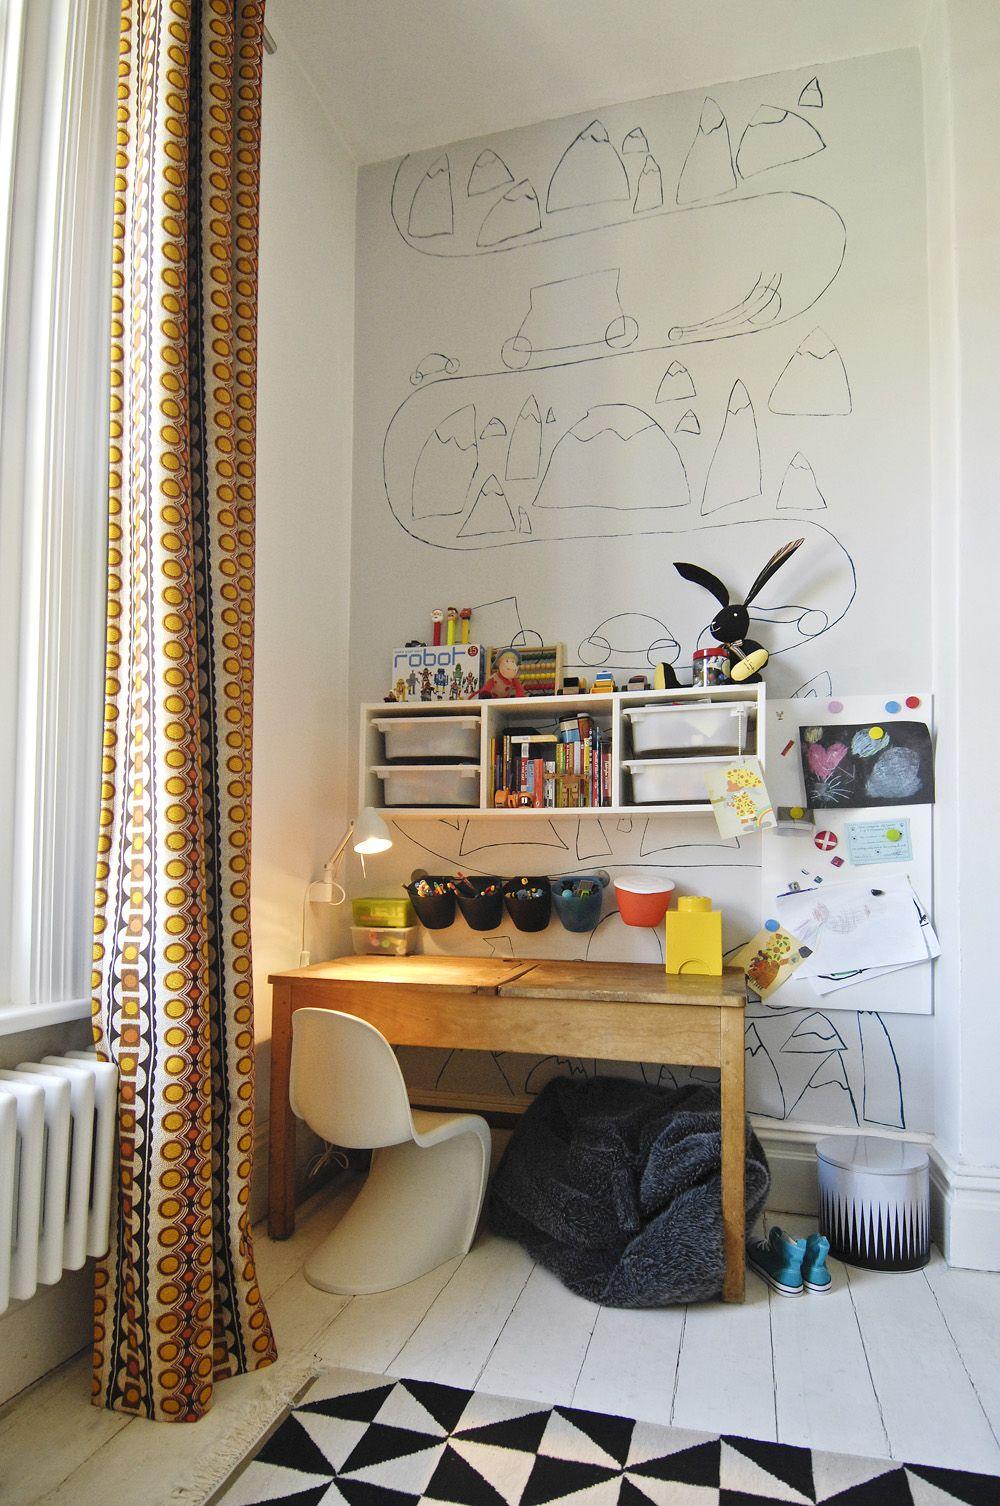 Rentrée des classes : Un coin bureau dans la chambre | Kid room ...